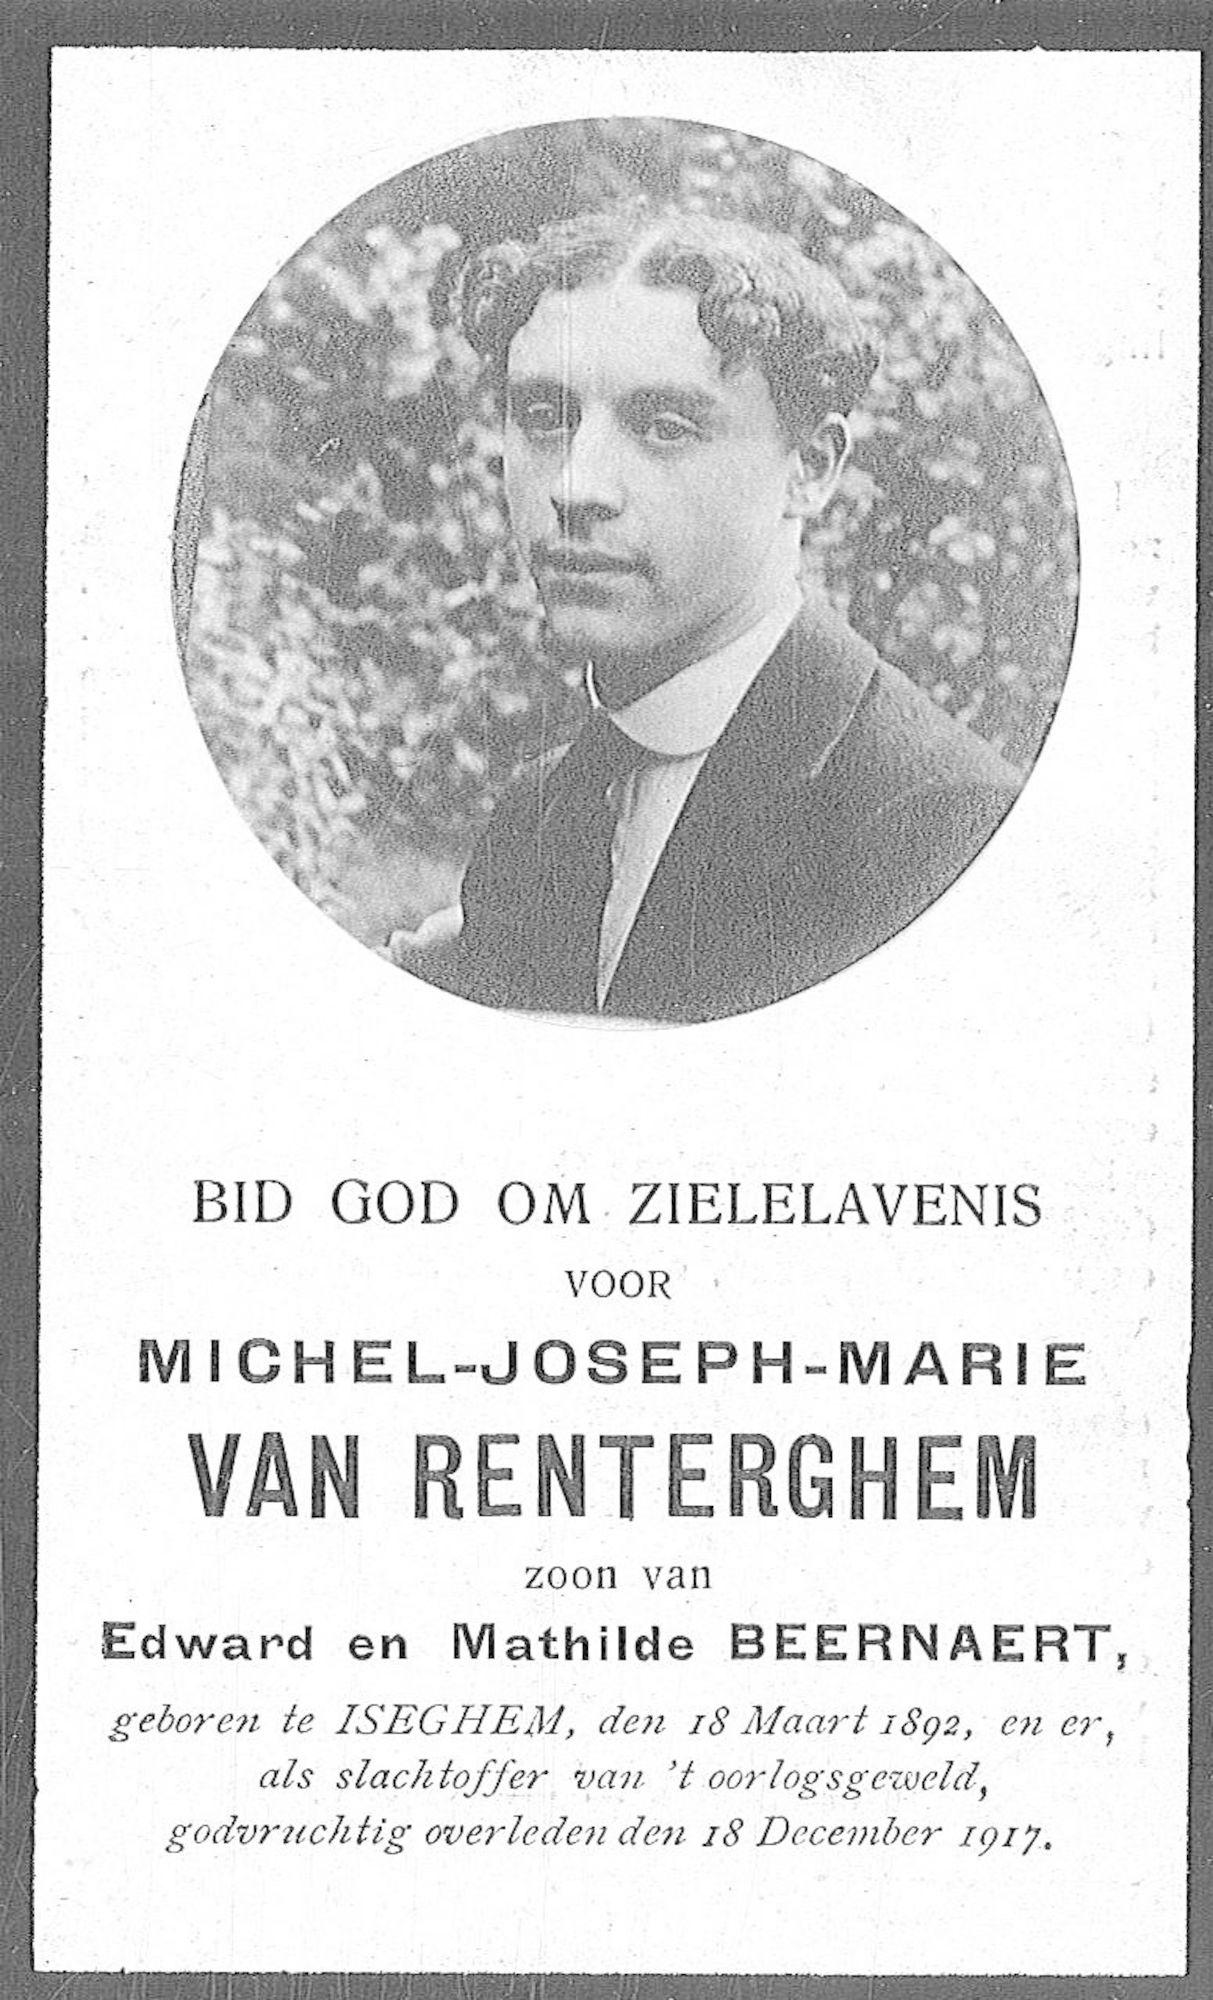 Michel-Joseph-Marie Van Renterghem